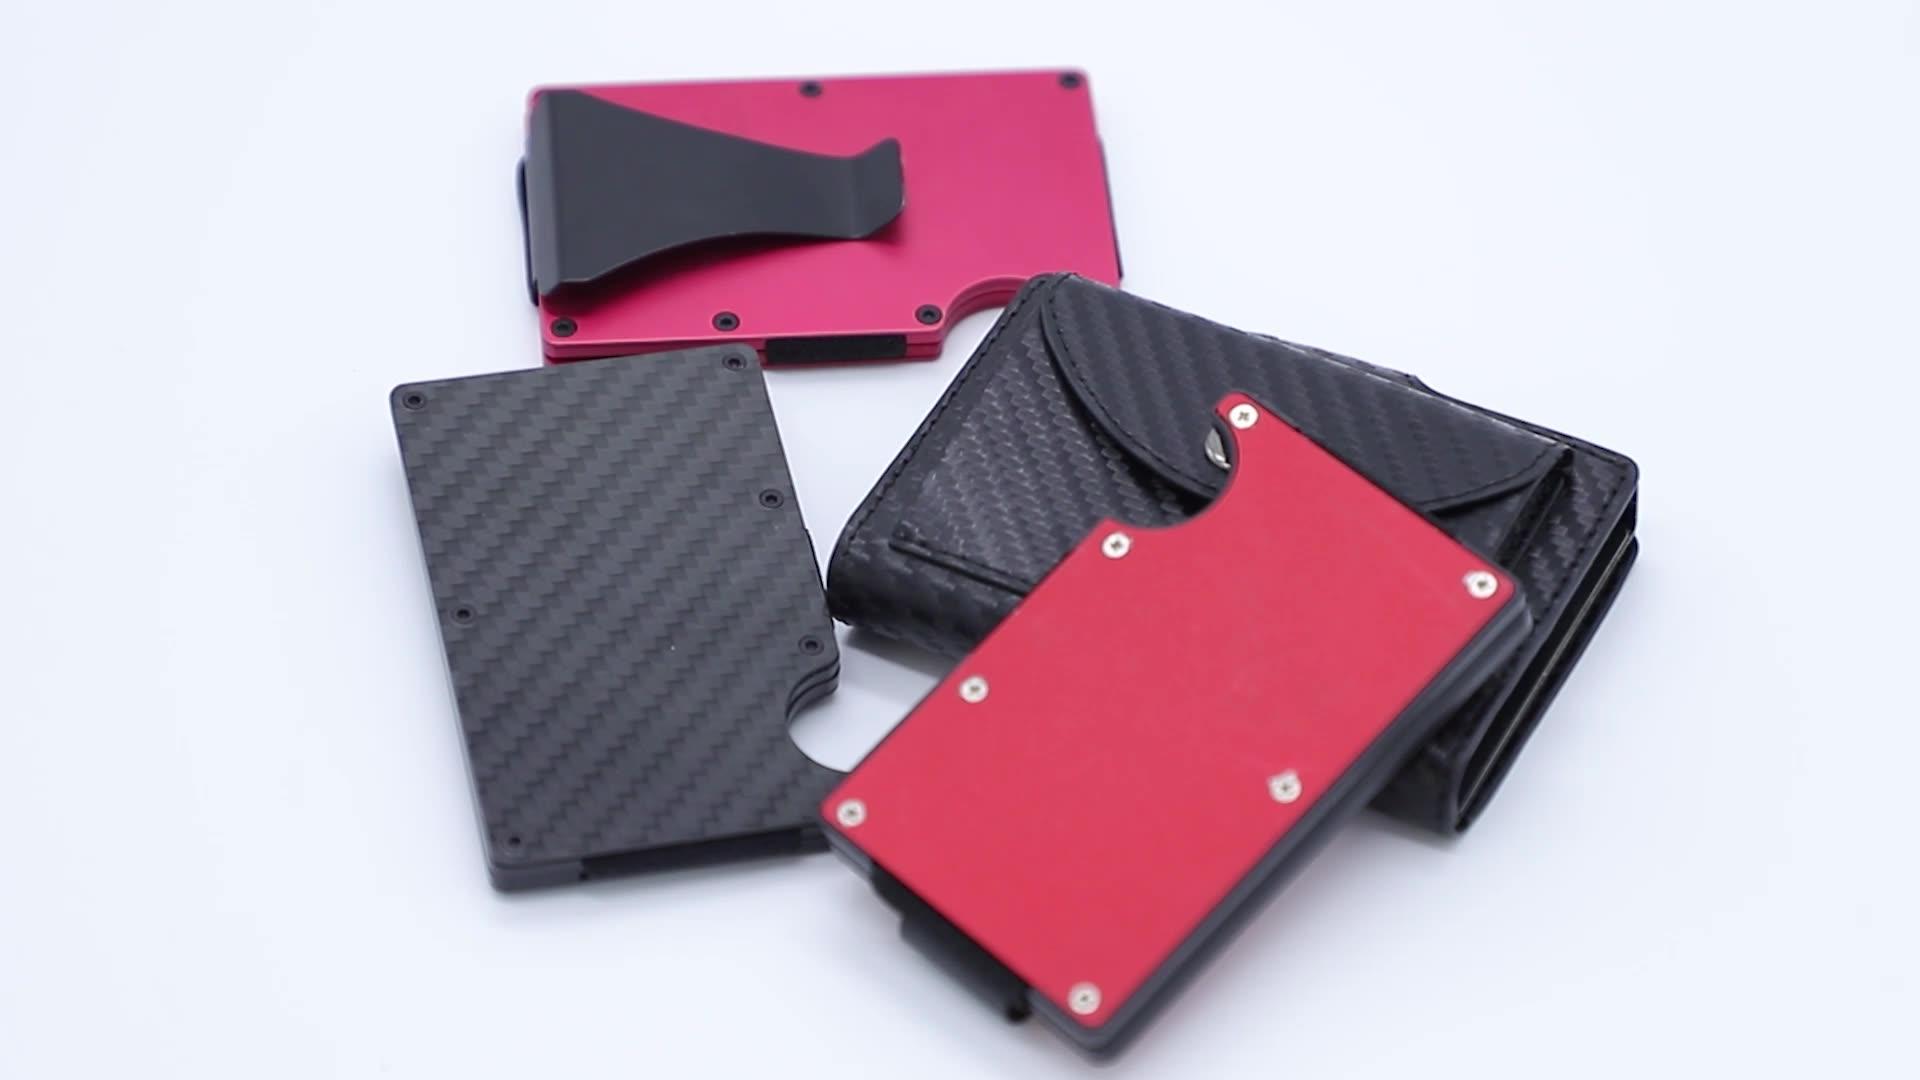 2020 new release Carbon Fiber Aluminum Mens Wallet Money Clip Wallets for Men RFID Blocking Minimalist Wallet